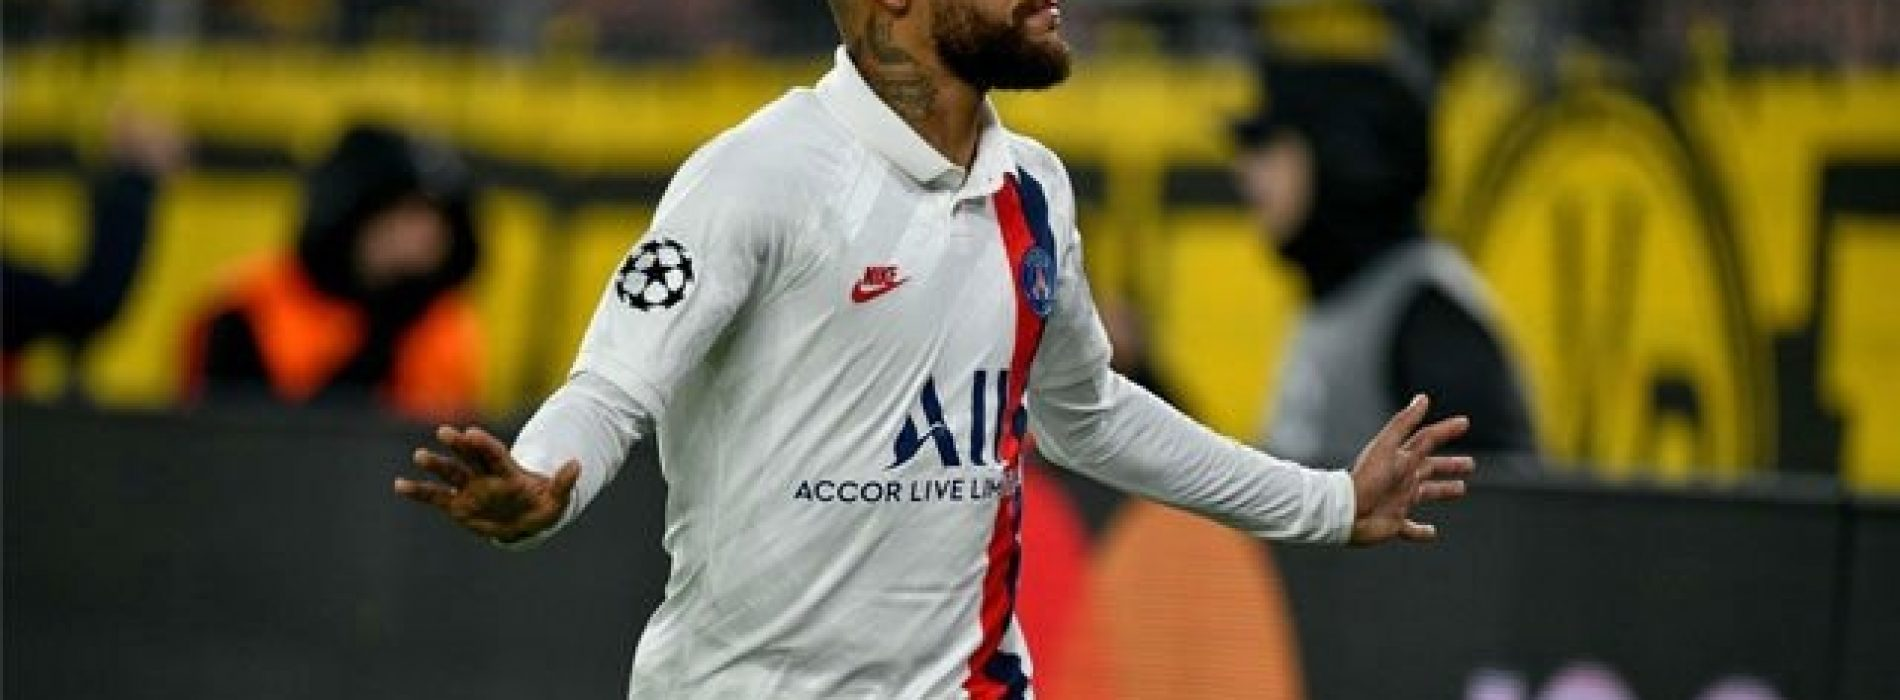 Champions League, in un Parc des Princes a porte chiuse va avanti il PSG. 2-0 al Borussia Dortmund